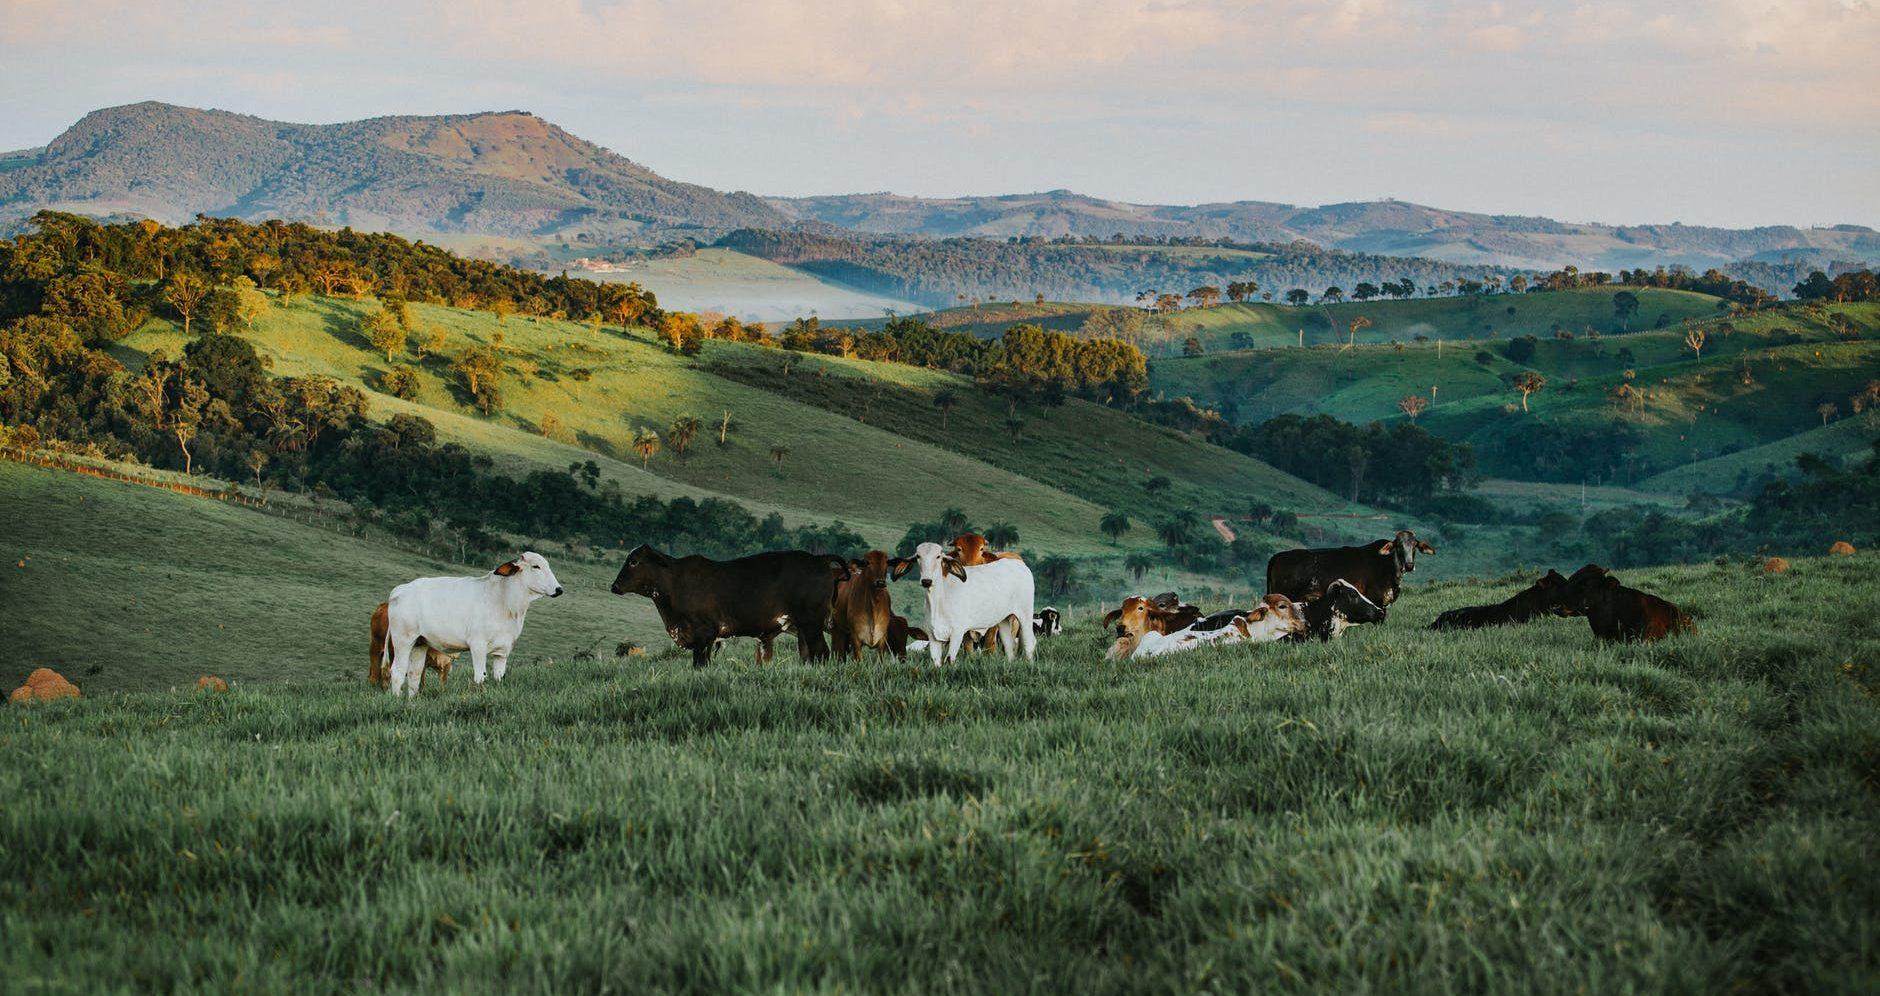 herd of cattle in daytime